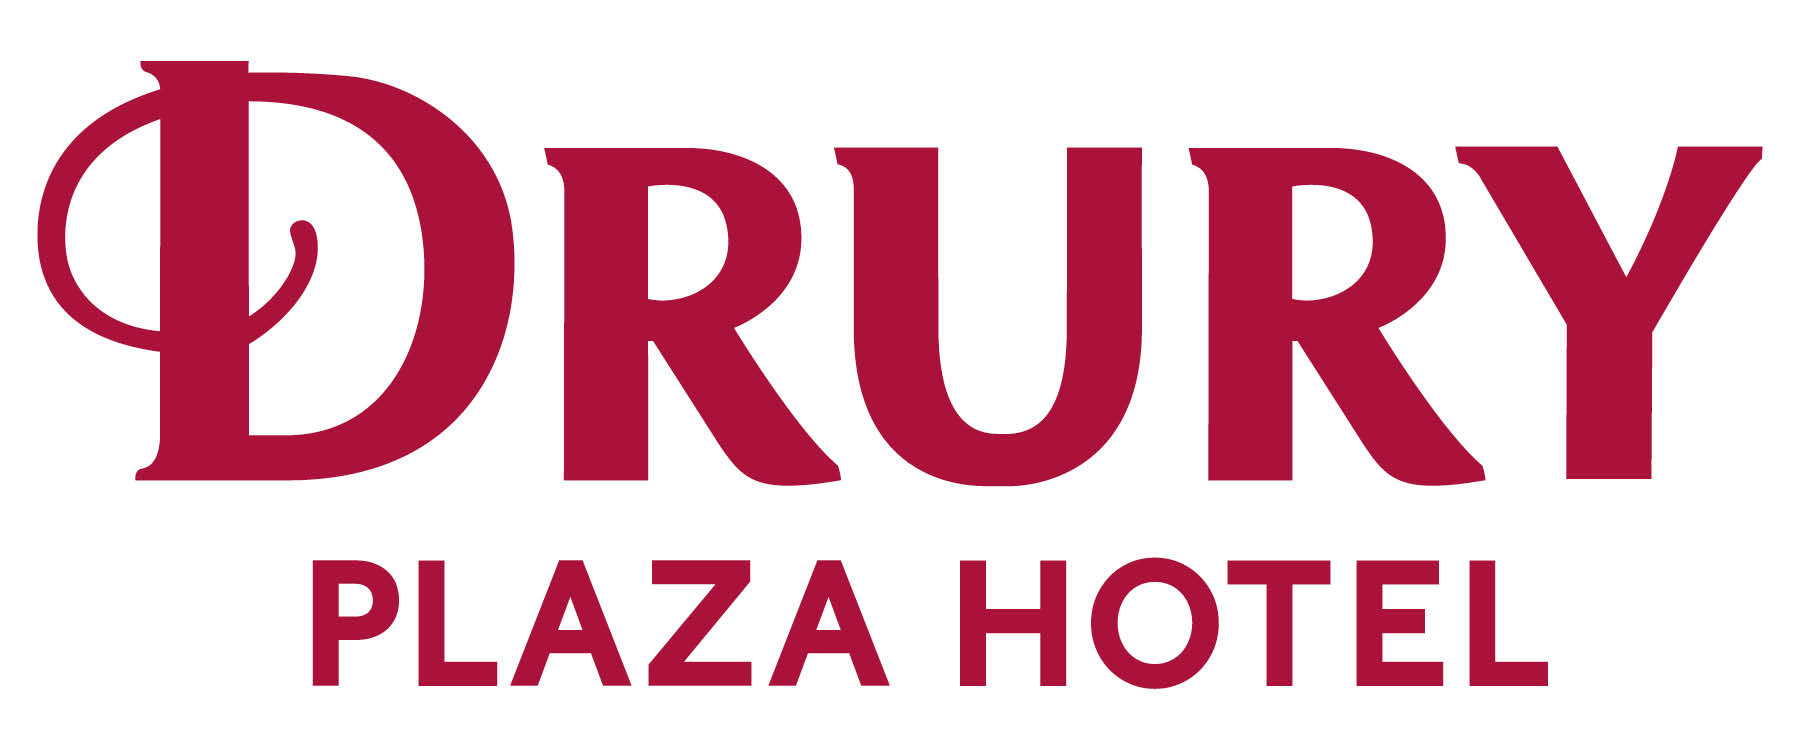 Drury Plaza Hotel - Chesterfield, MO